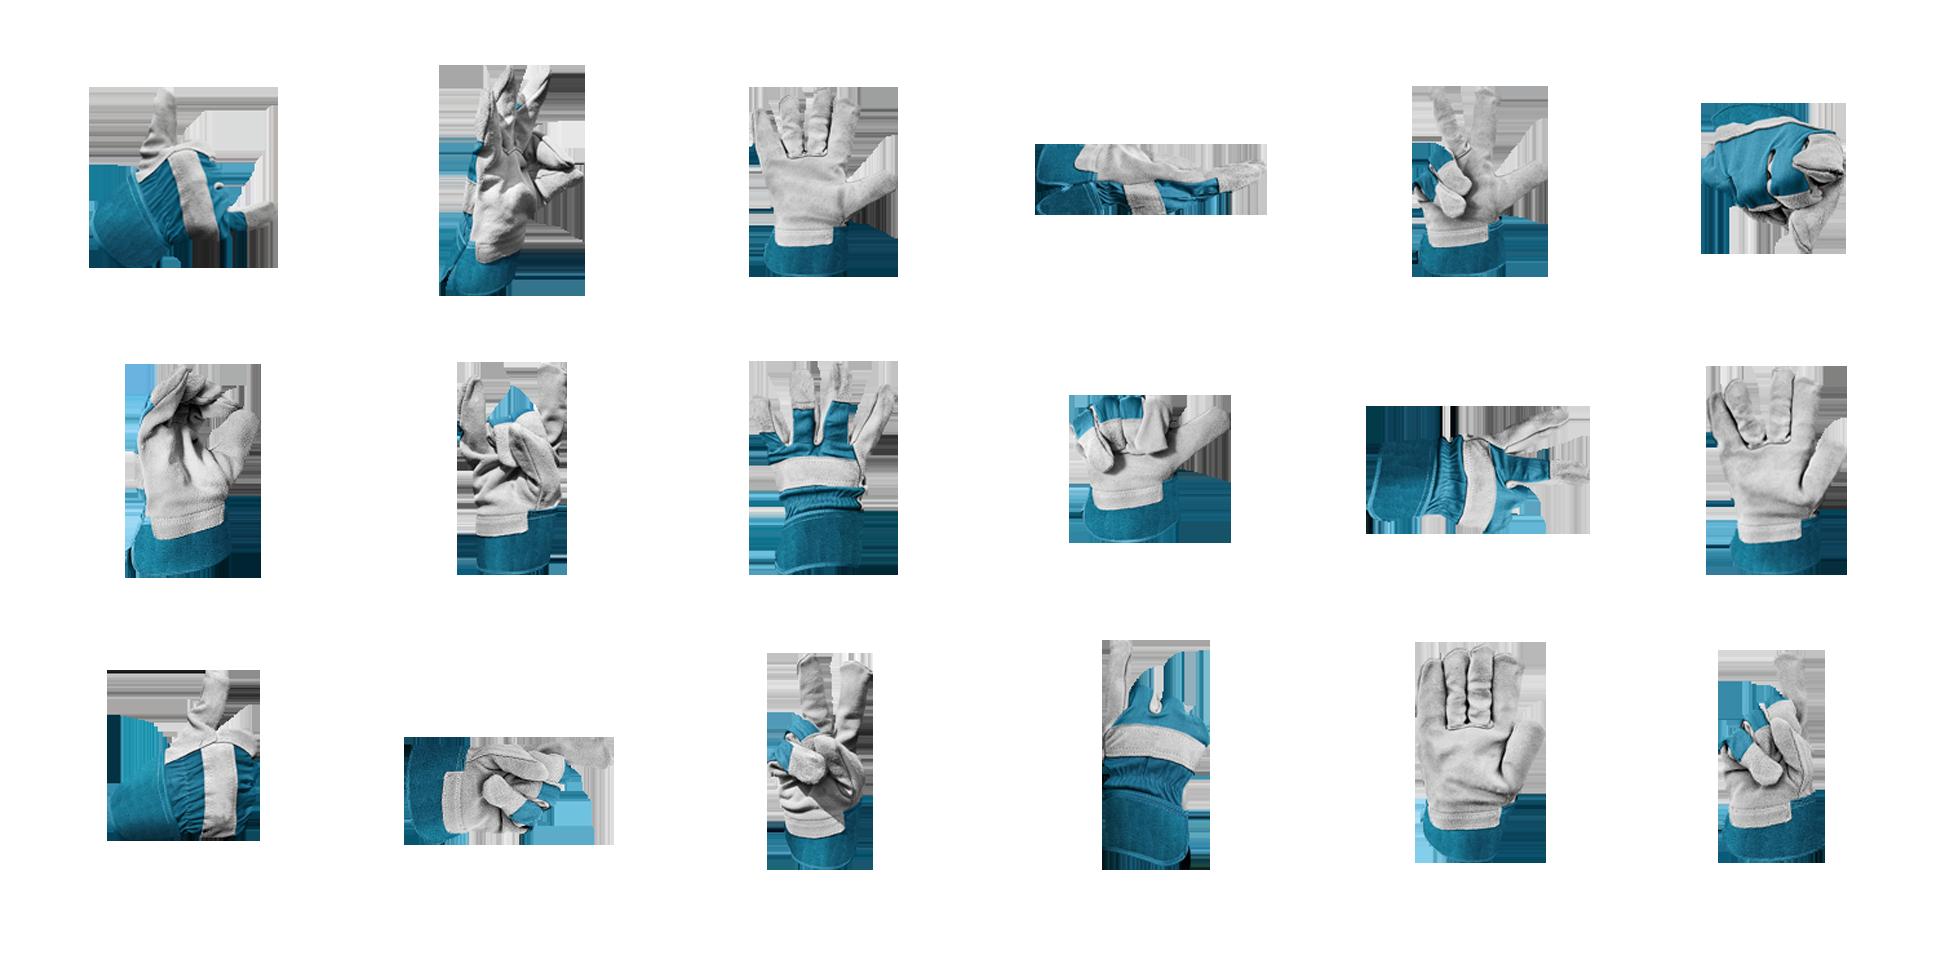 famo corporate-identity handschuhe polarwerk